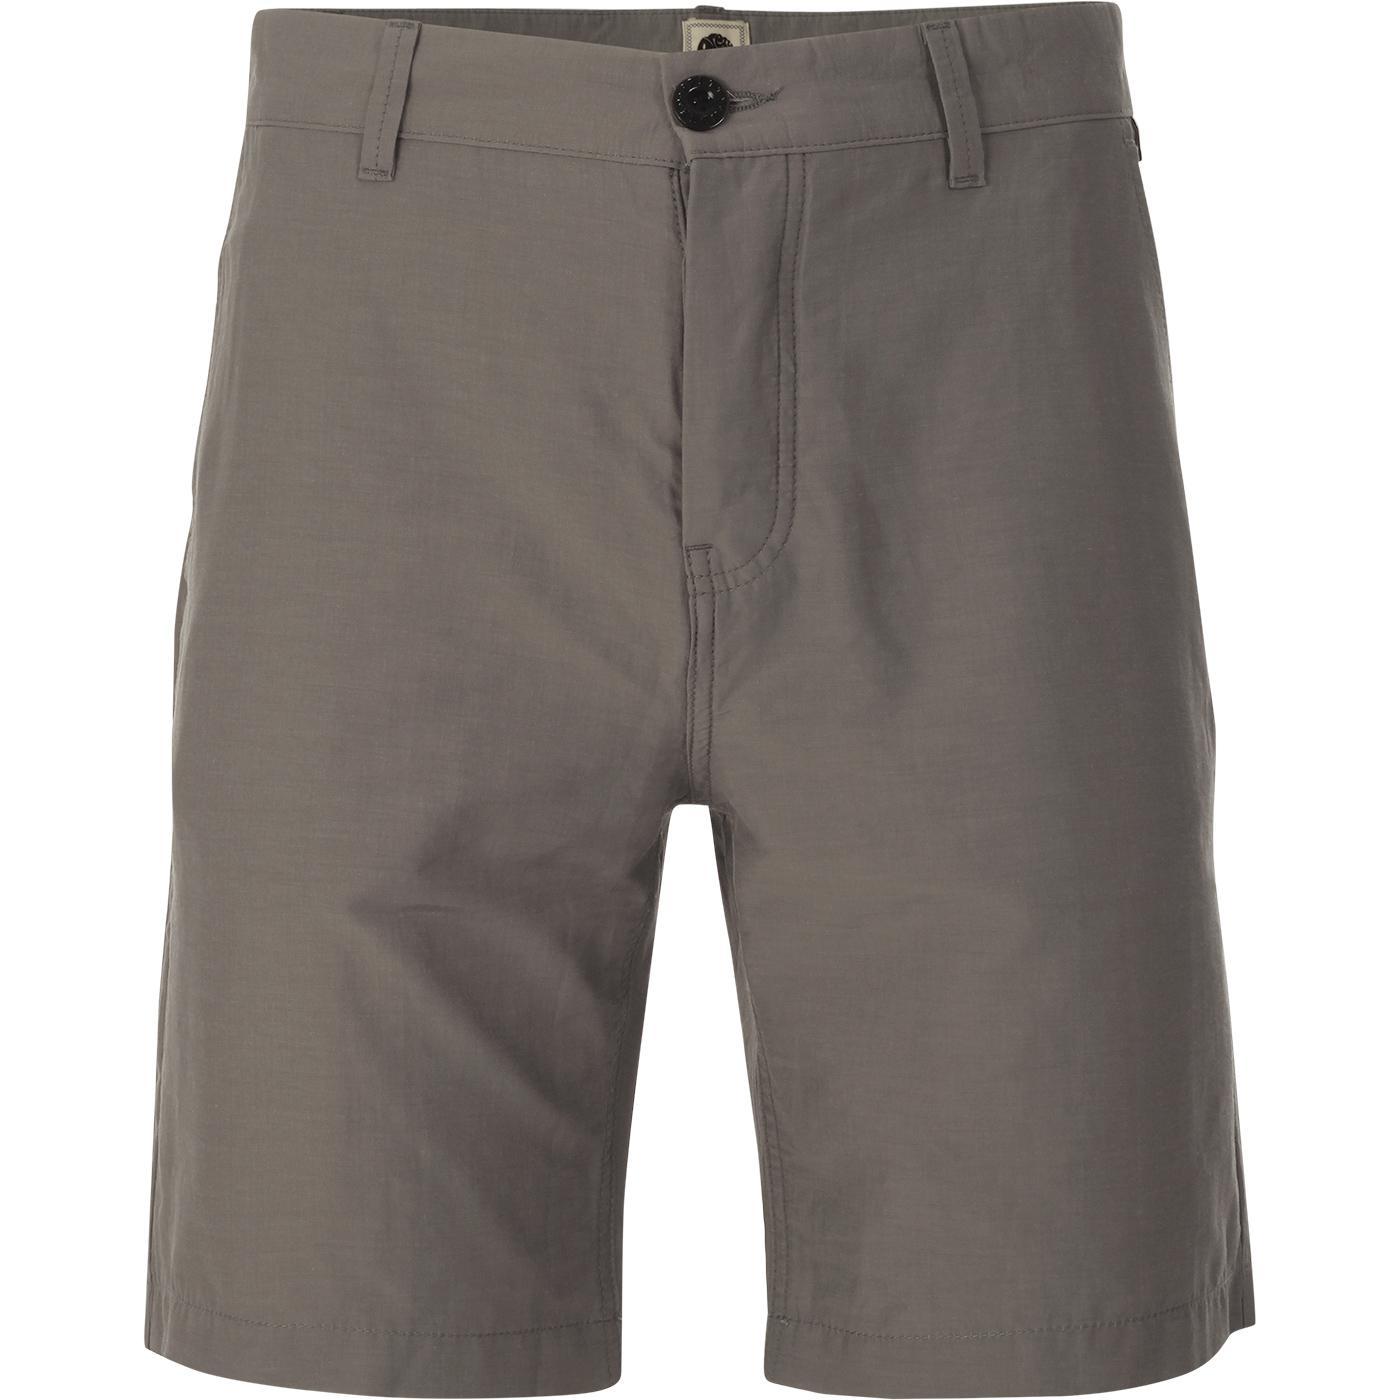 PRETTY GREEN Men's Retro Button Fly Shorts (Grey)